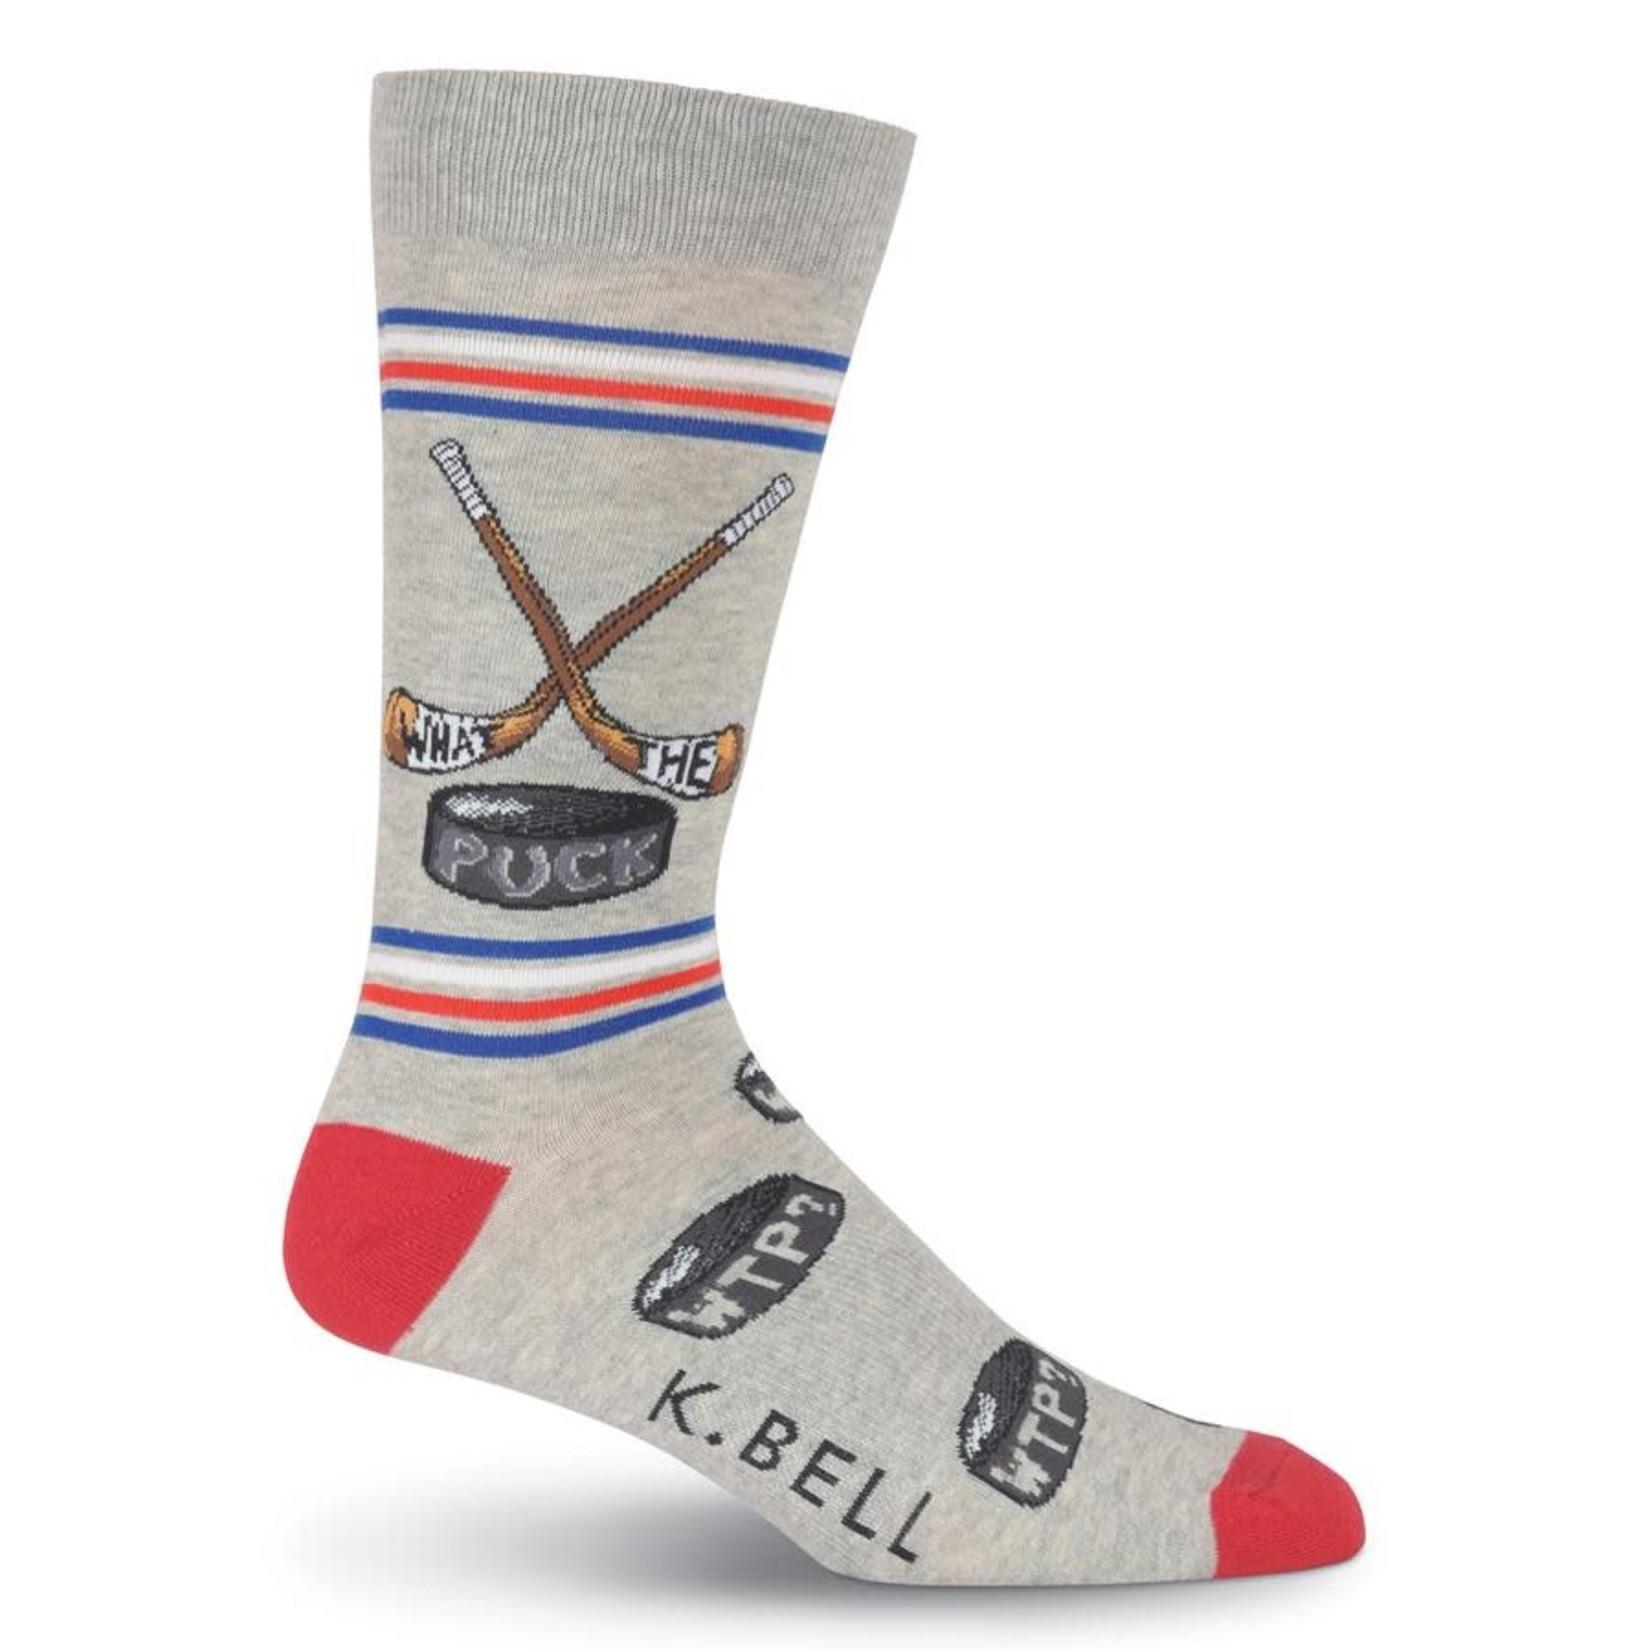 Socks (Mens) - What The Puck - Hockey